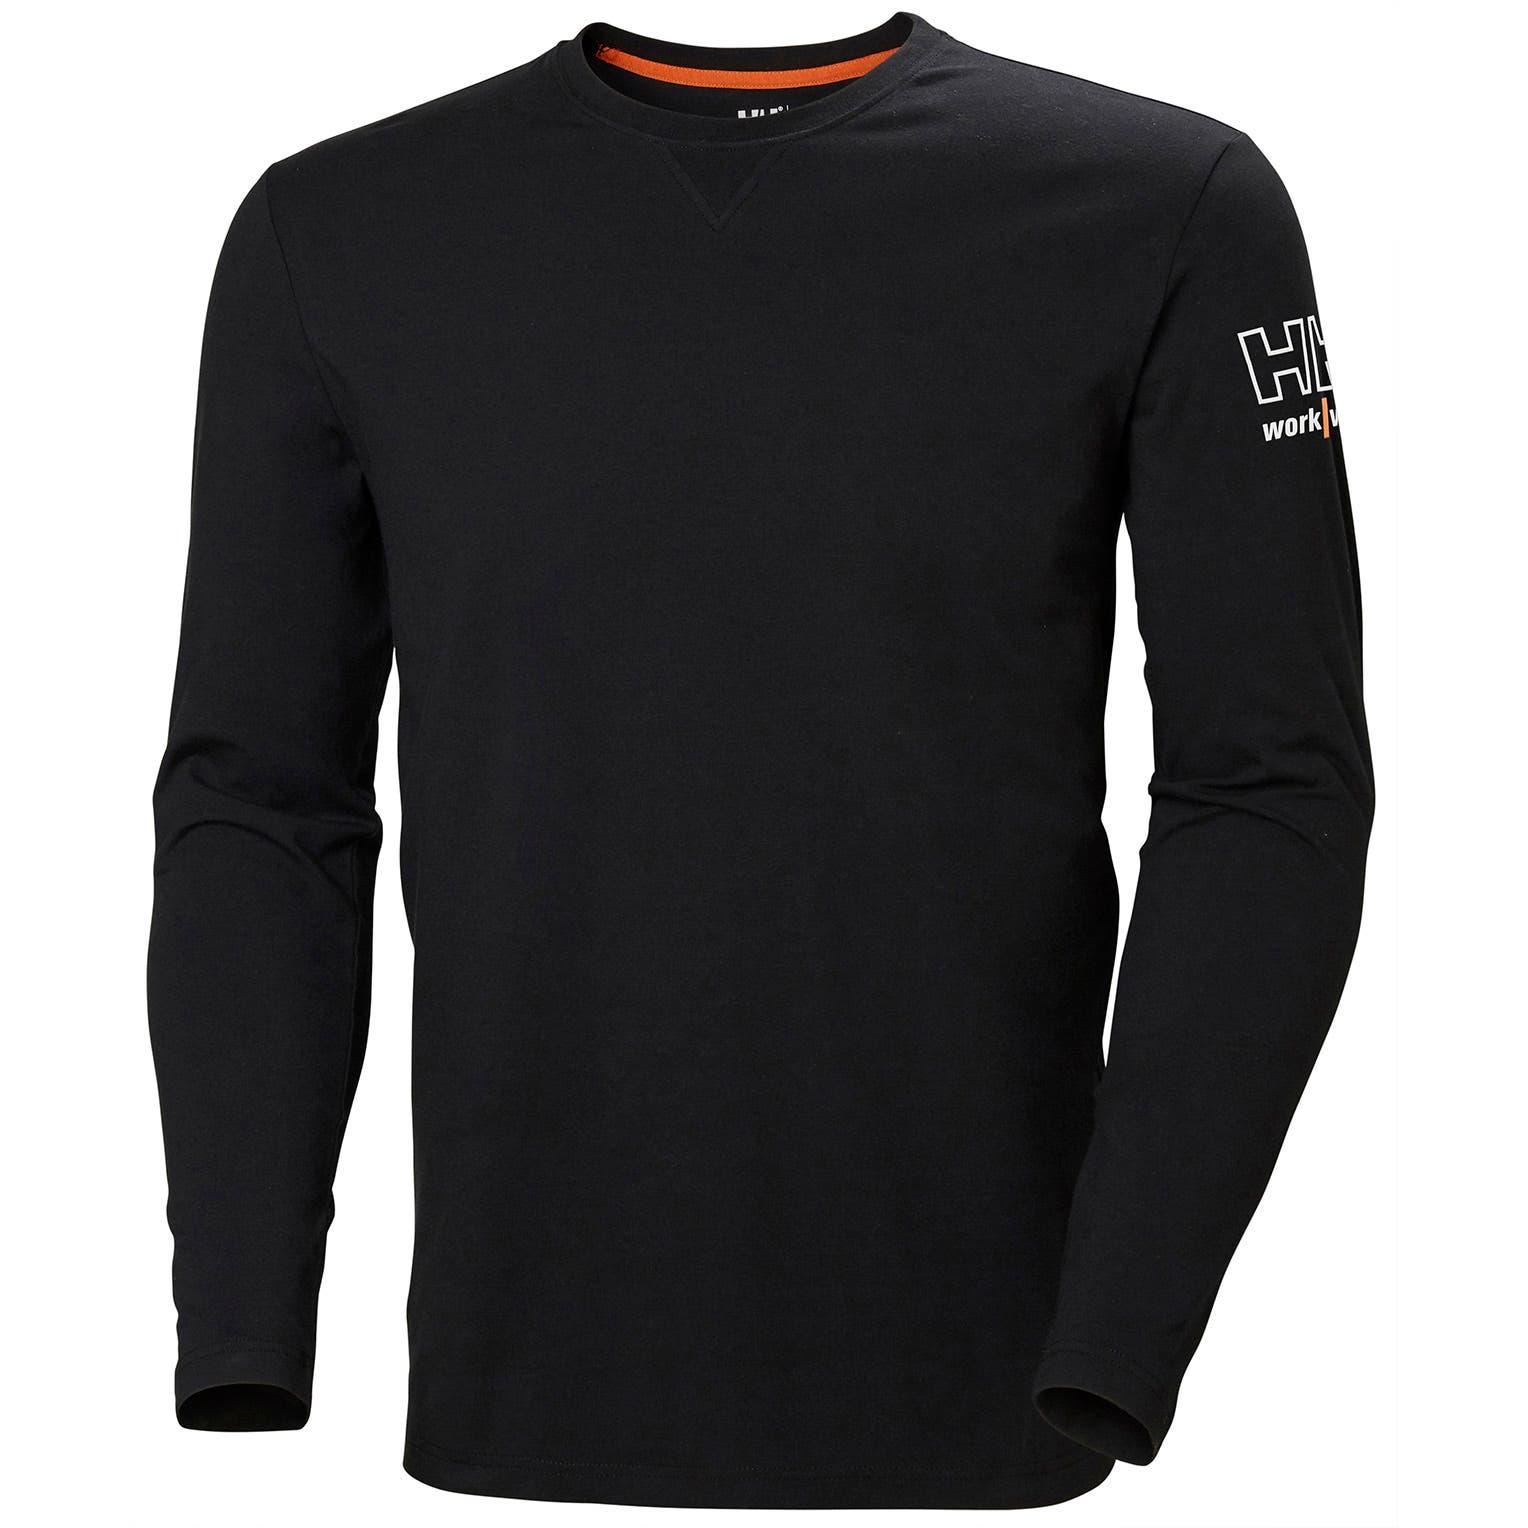 Helly Hansen Kensington tričko dlhý rukáv čierne